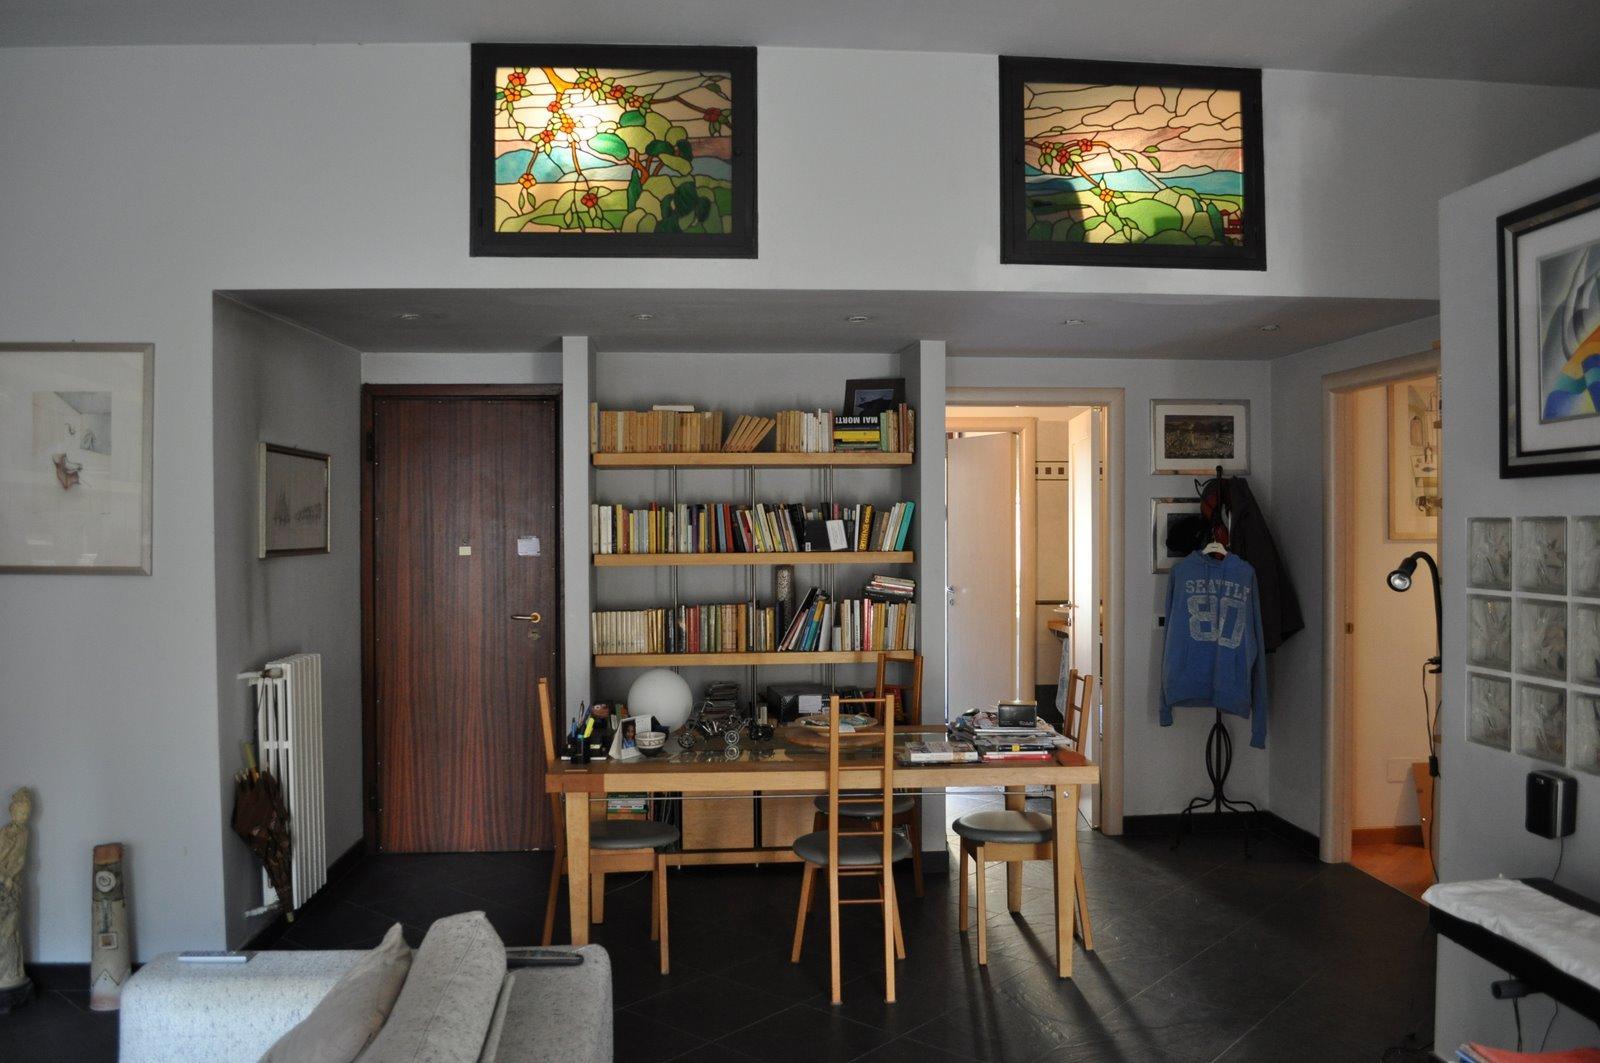 Cucina shabby con tendine - Cucina e salotto open space ...